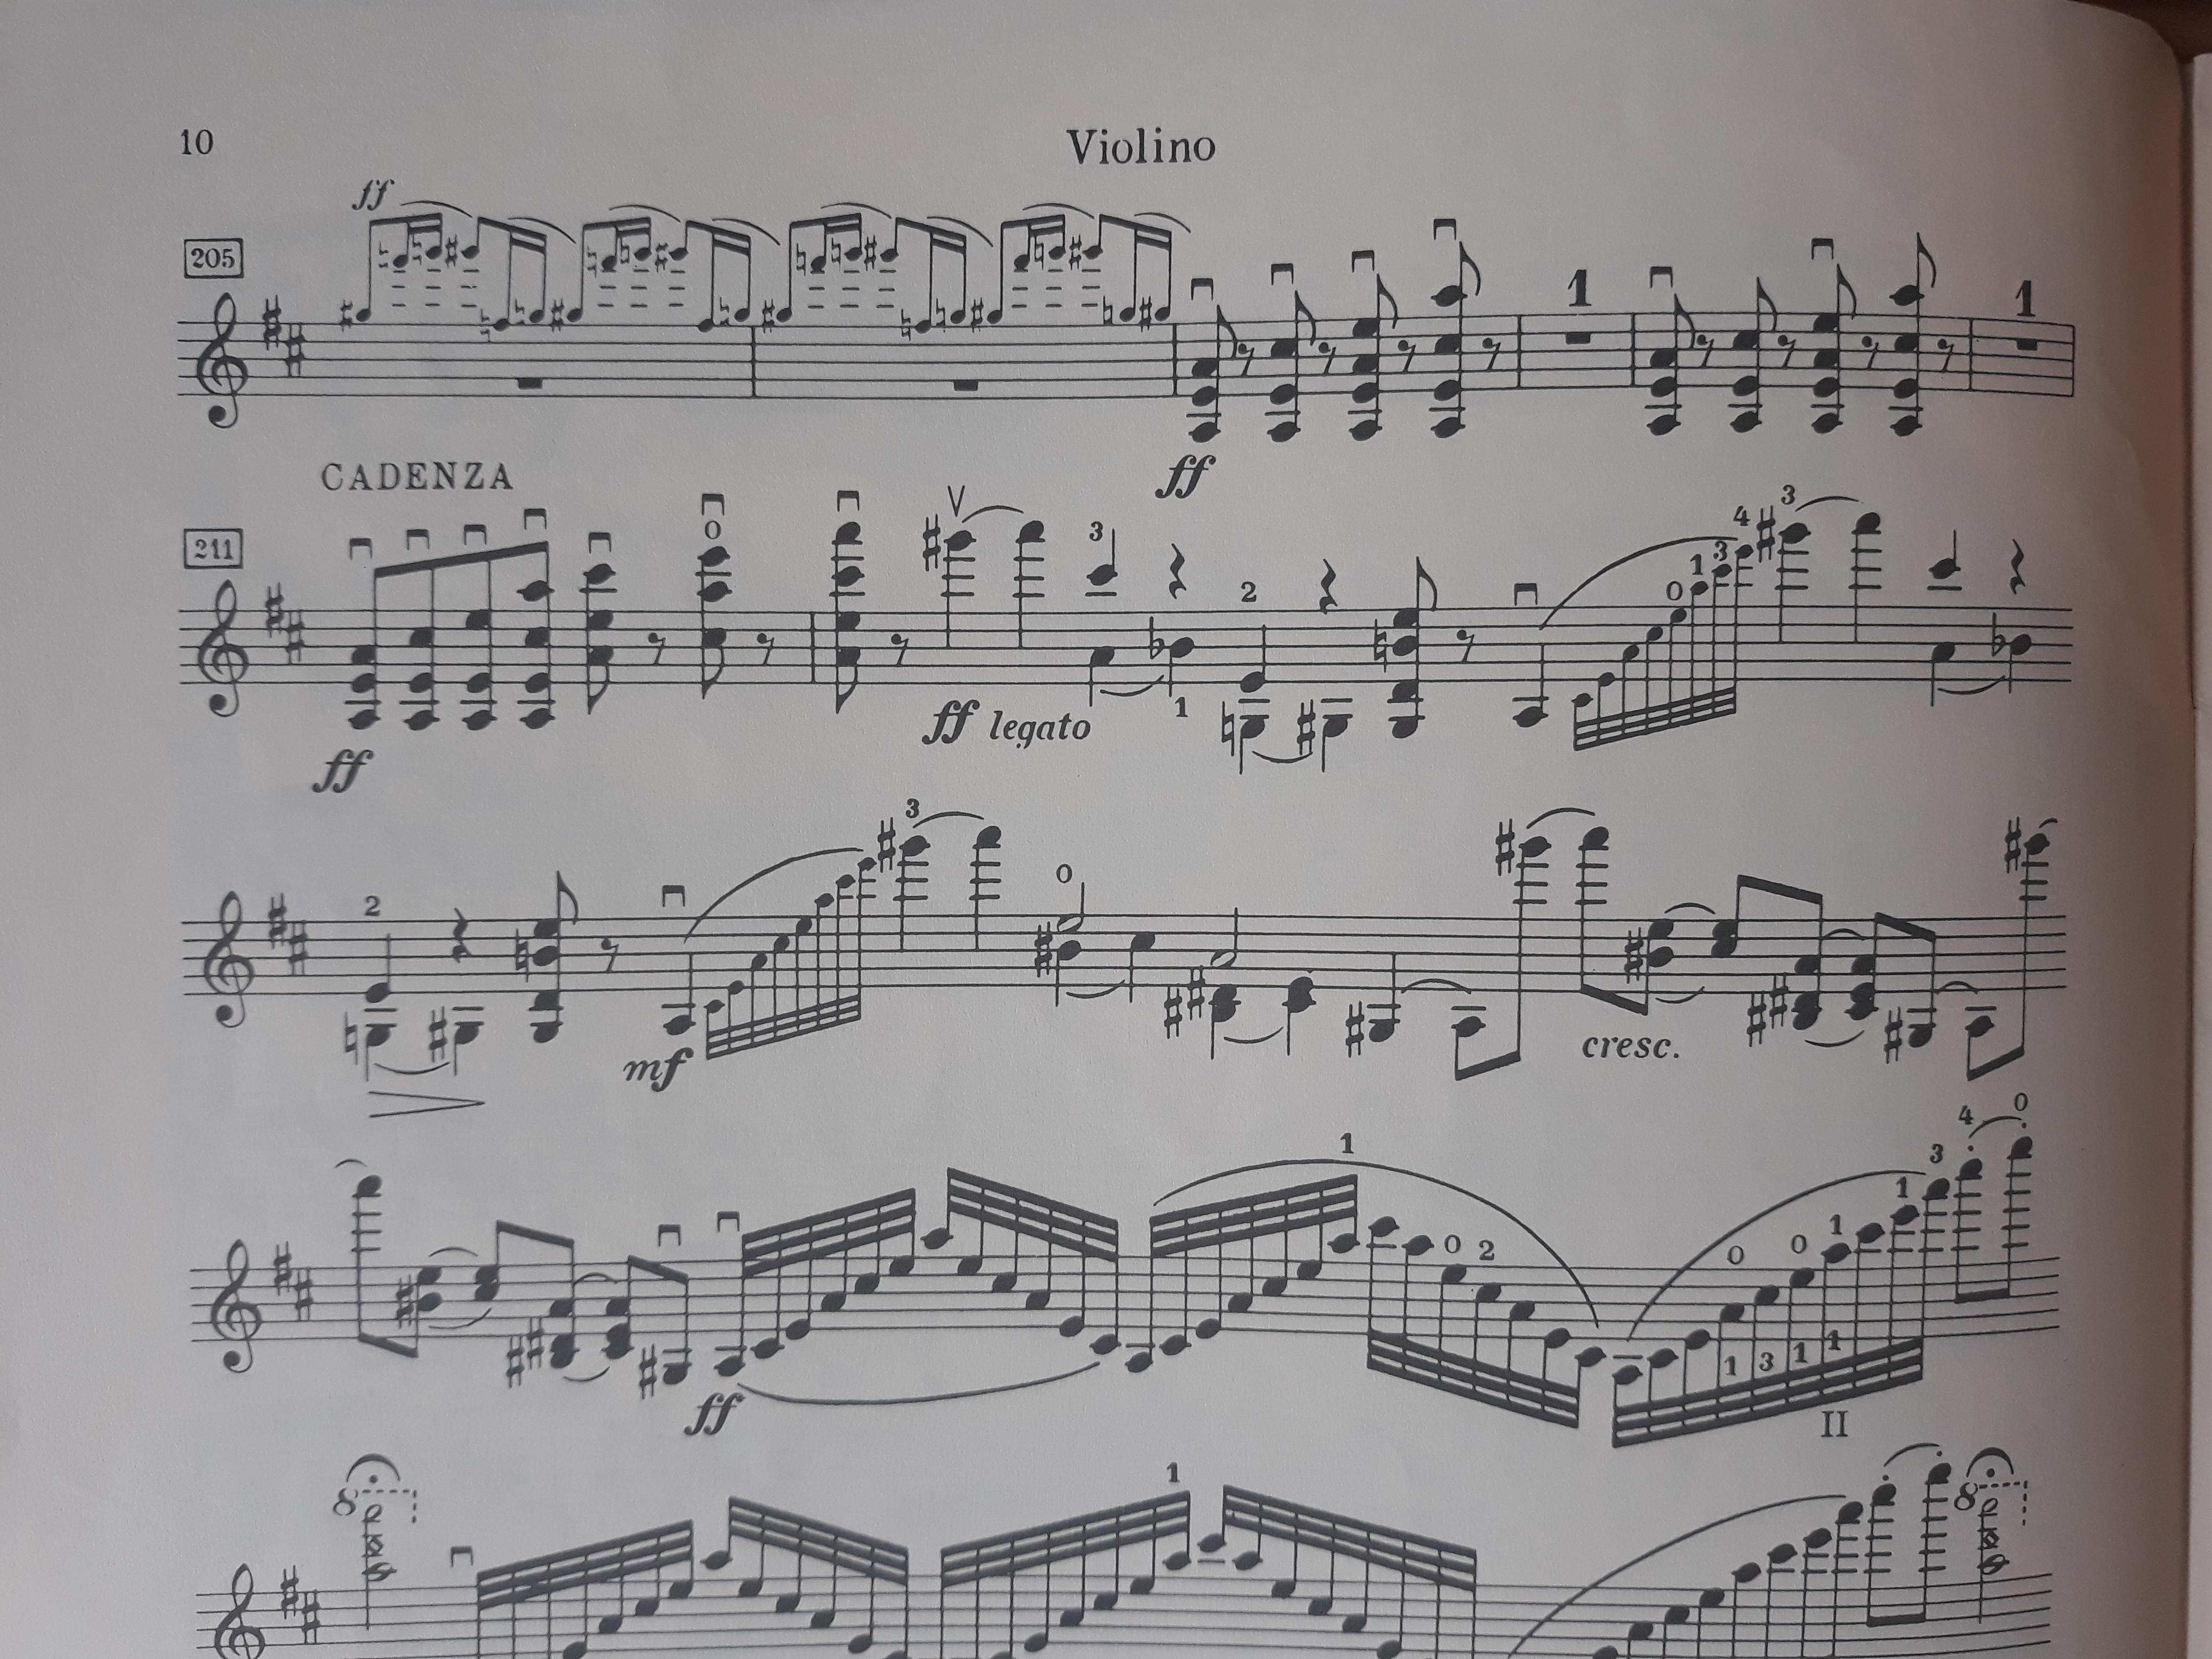 Cadenza Music Definition : Ra dunkle technik presents cadenza at stylus leeds